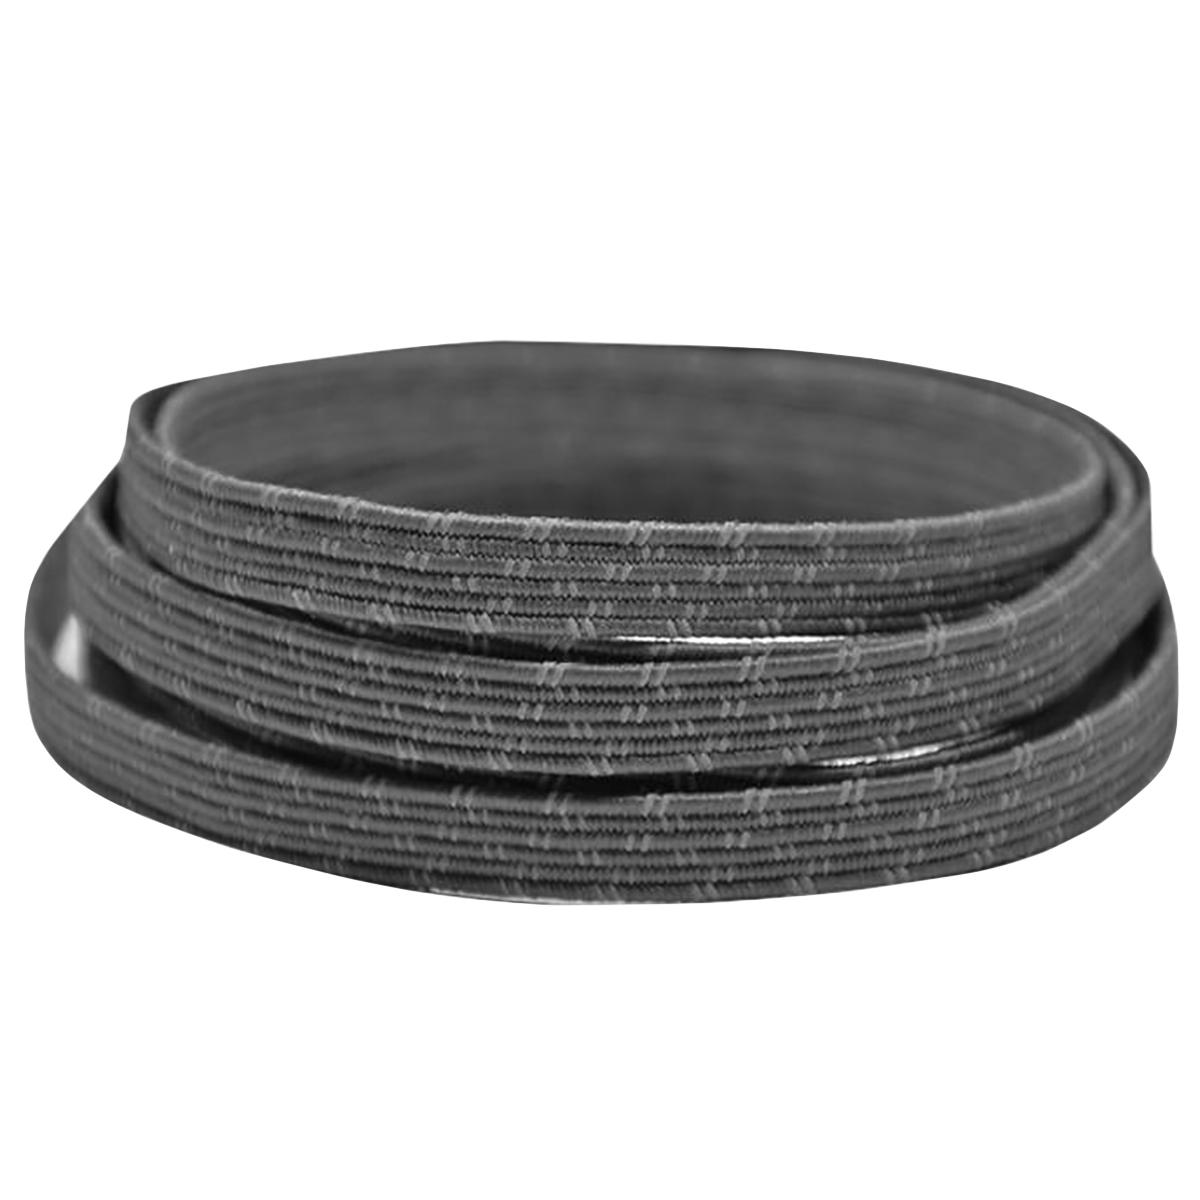 Xpand-Laces-Customizable-No-Tie-One-Size-Elastic-Shoelaces